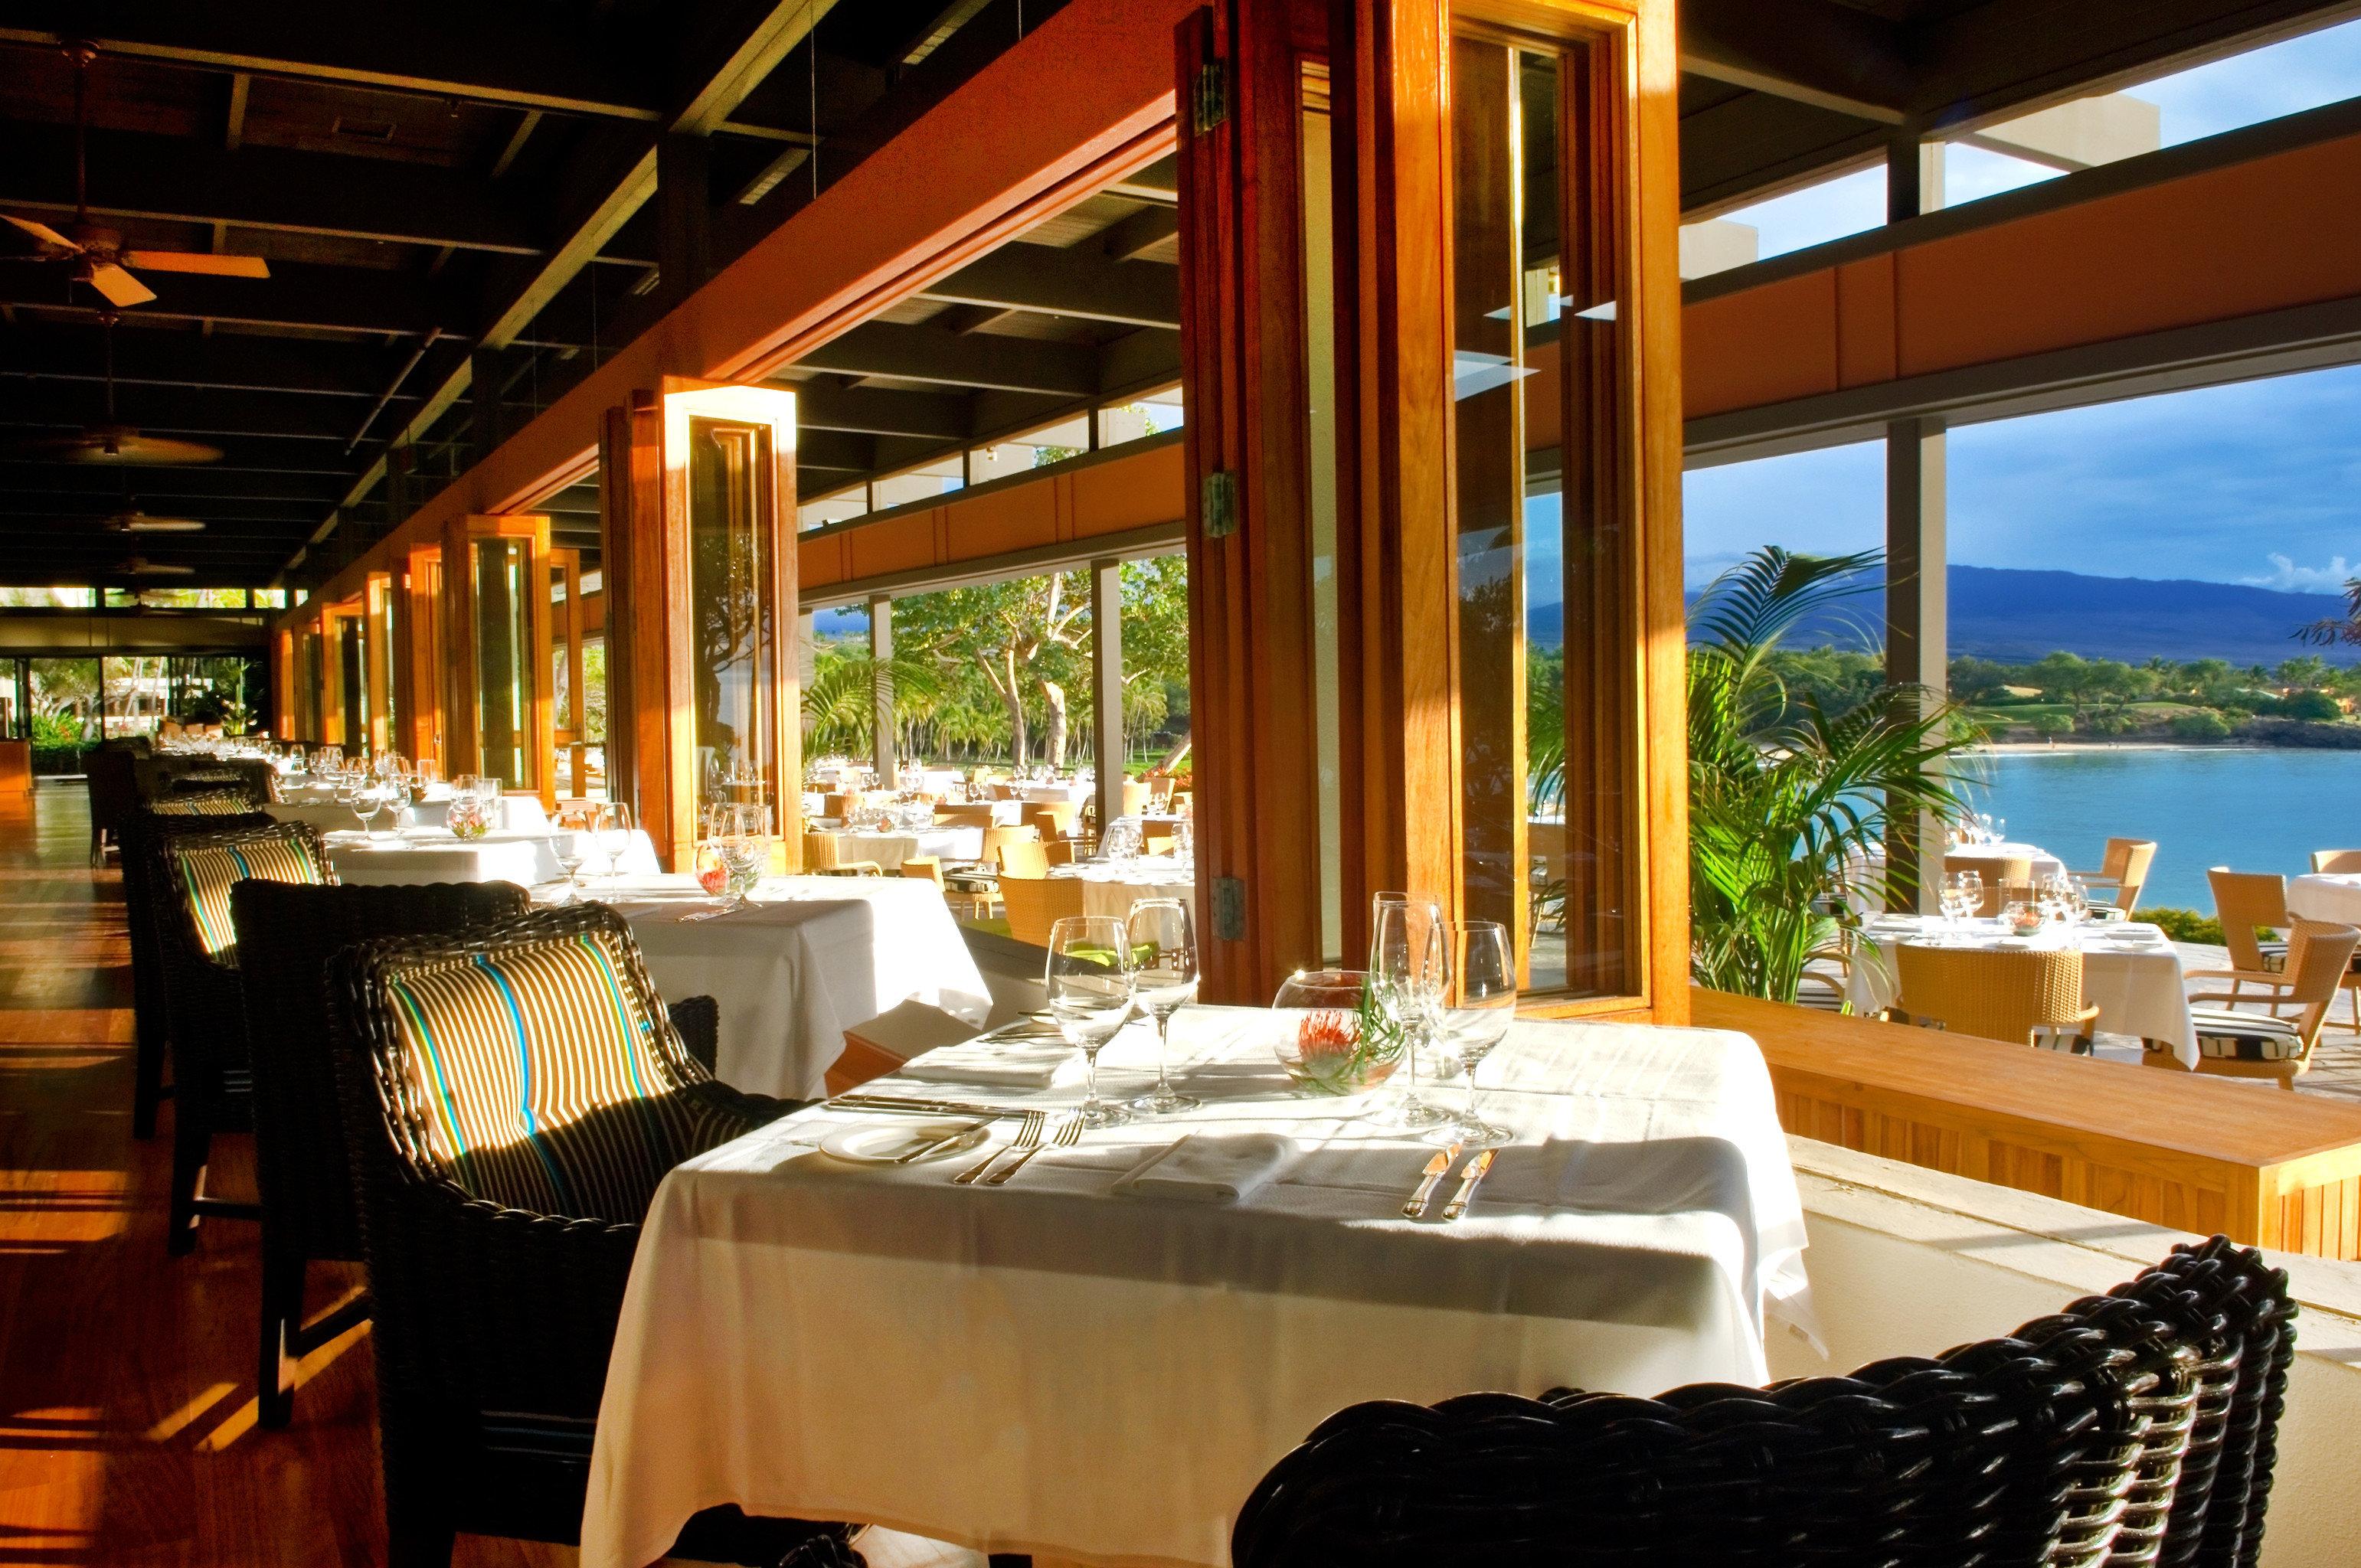 Dining Drink Eat Resort Scenic views property restaurant home Villa